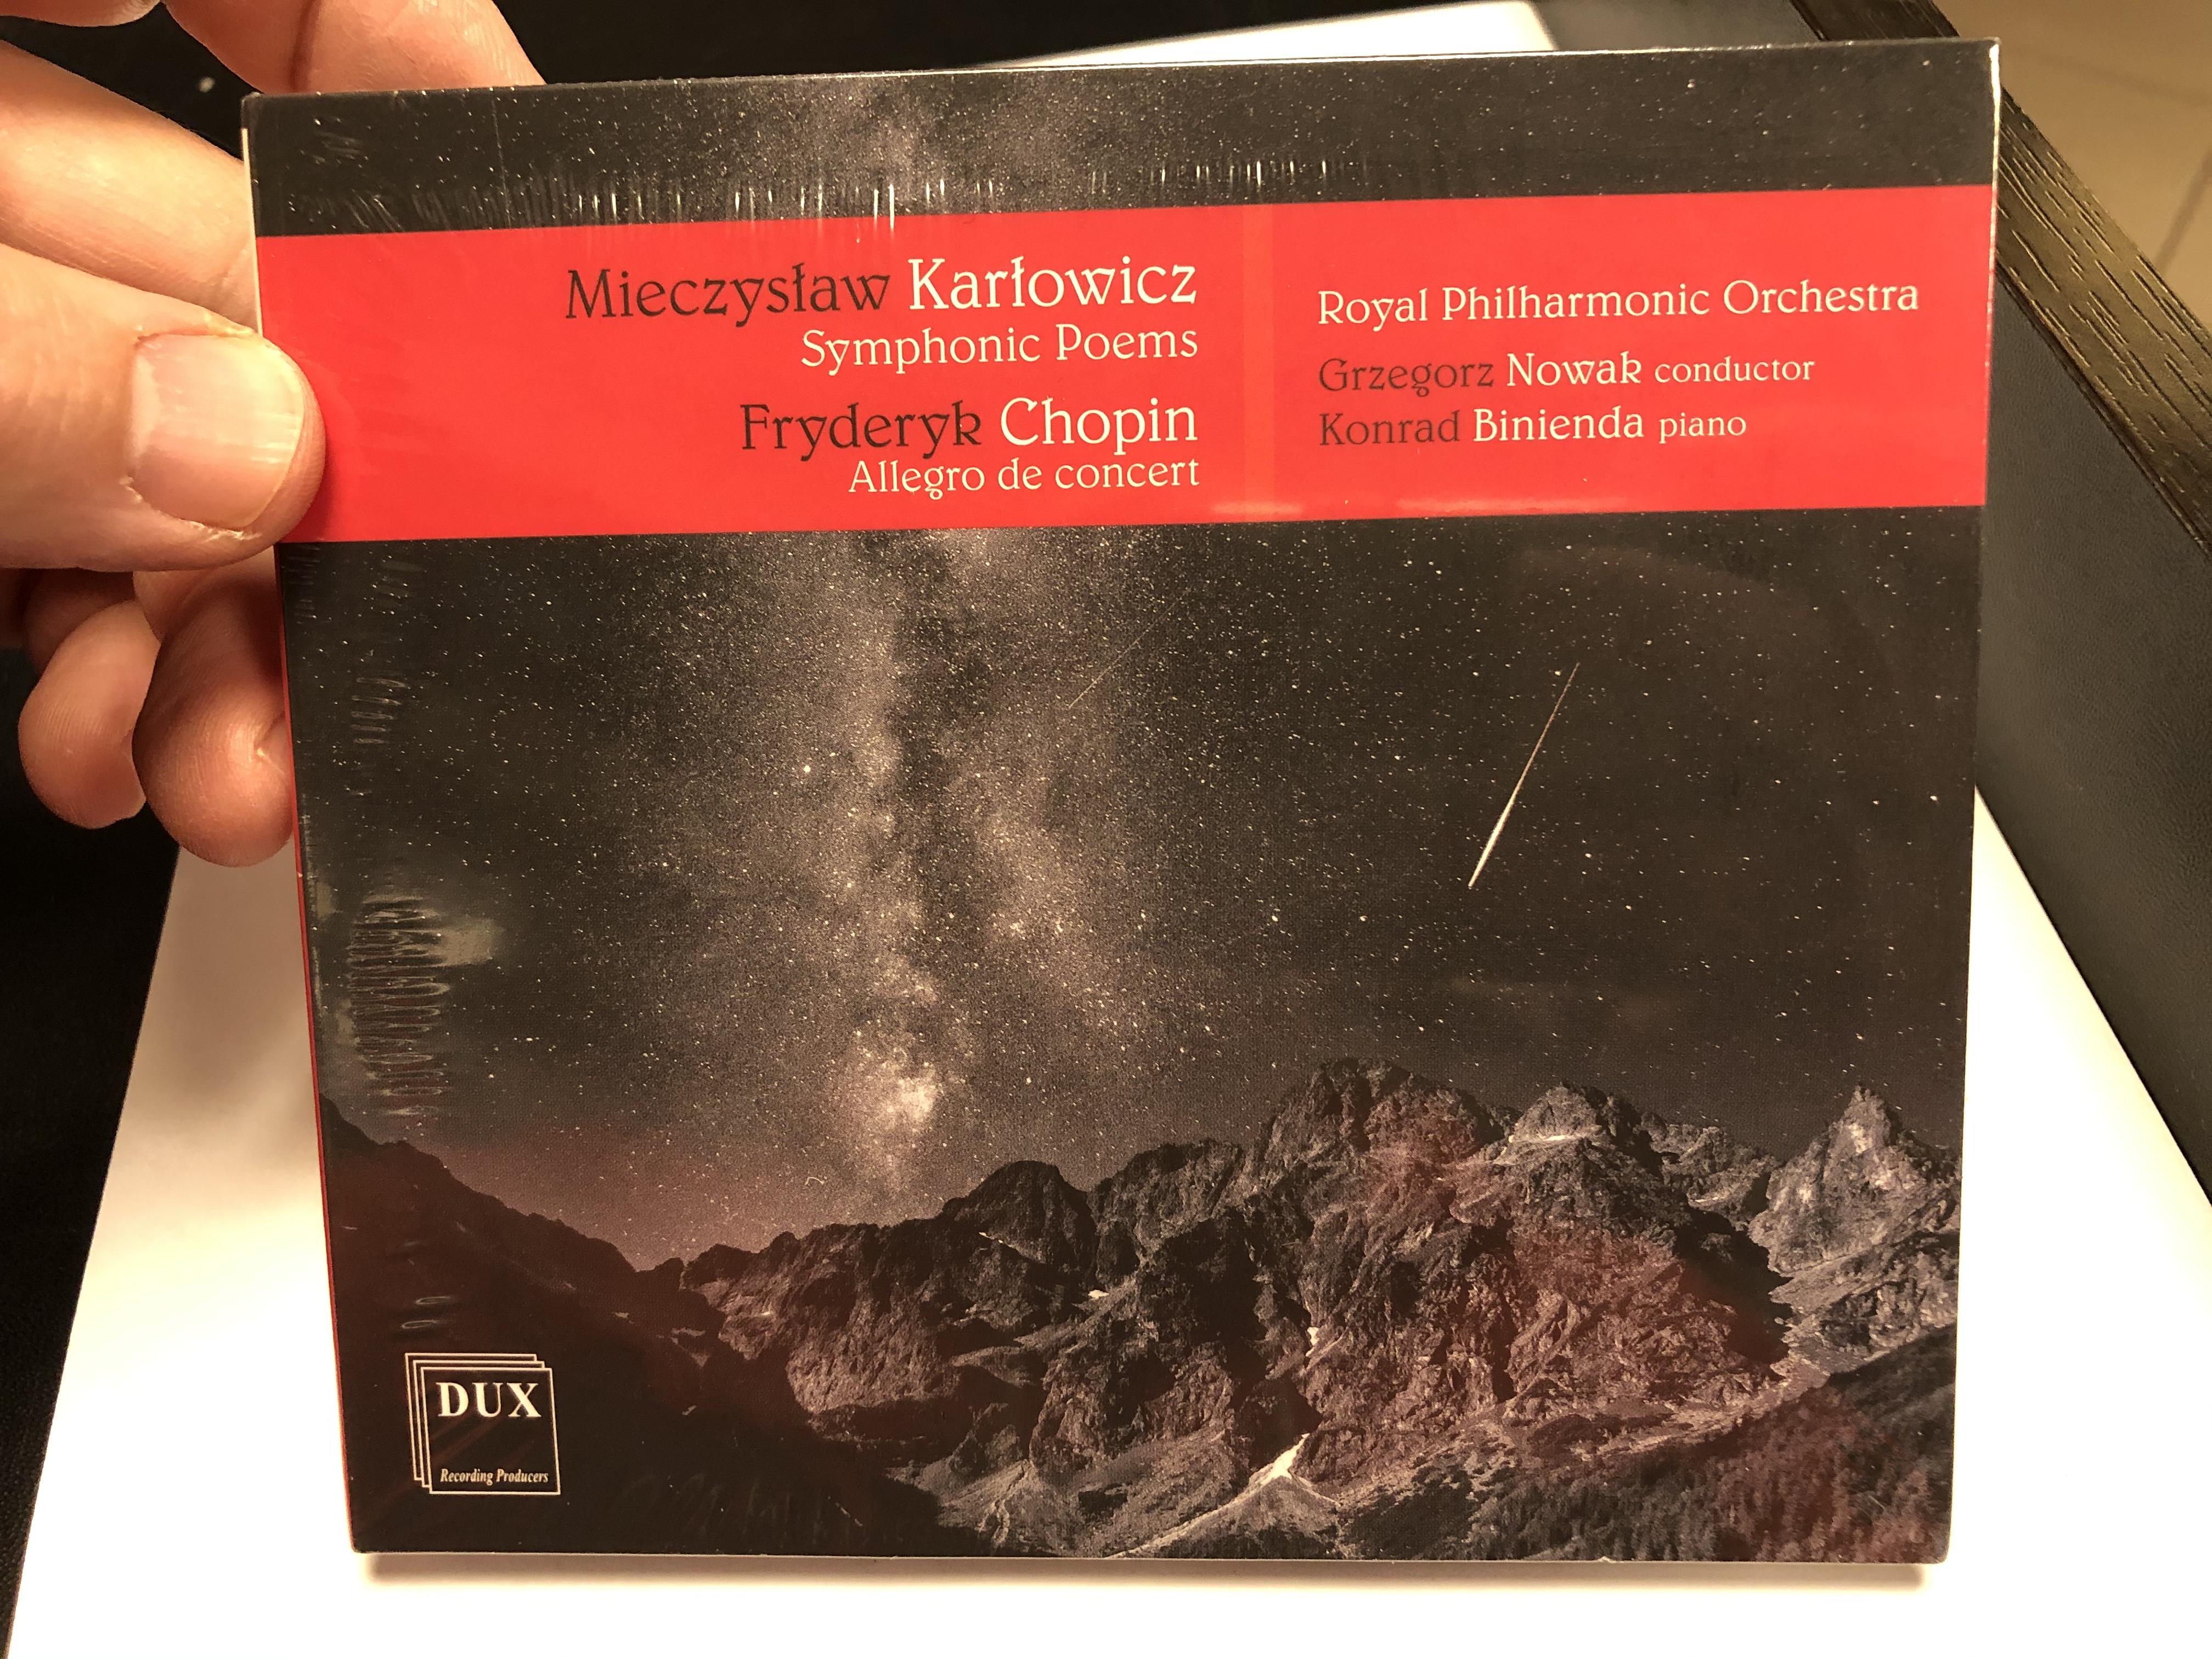 mieczyslaw-karlowicz-symphonic-poems-fryderyk-chopin-allegro-de-concert-royal-philharmonic-orchestra-grzegorz-nowak-conductor-konrad-binienda-piano-dux-recording-audio-cd-2019-du-1-.jpg